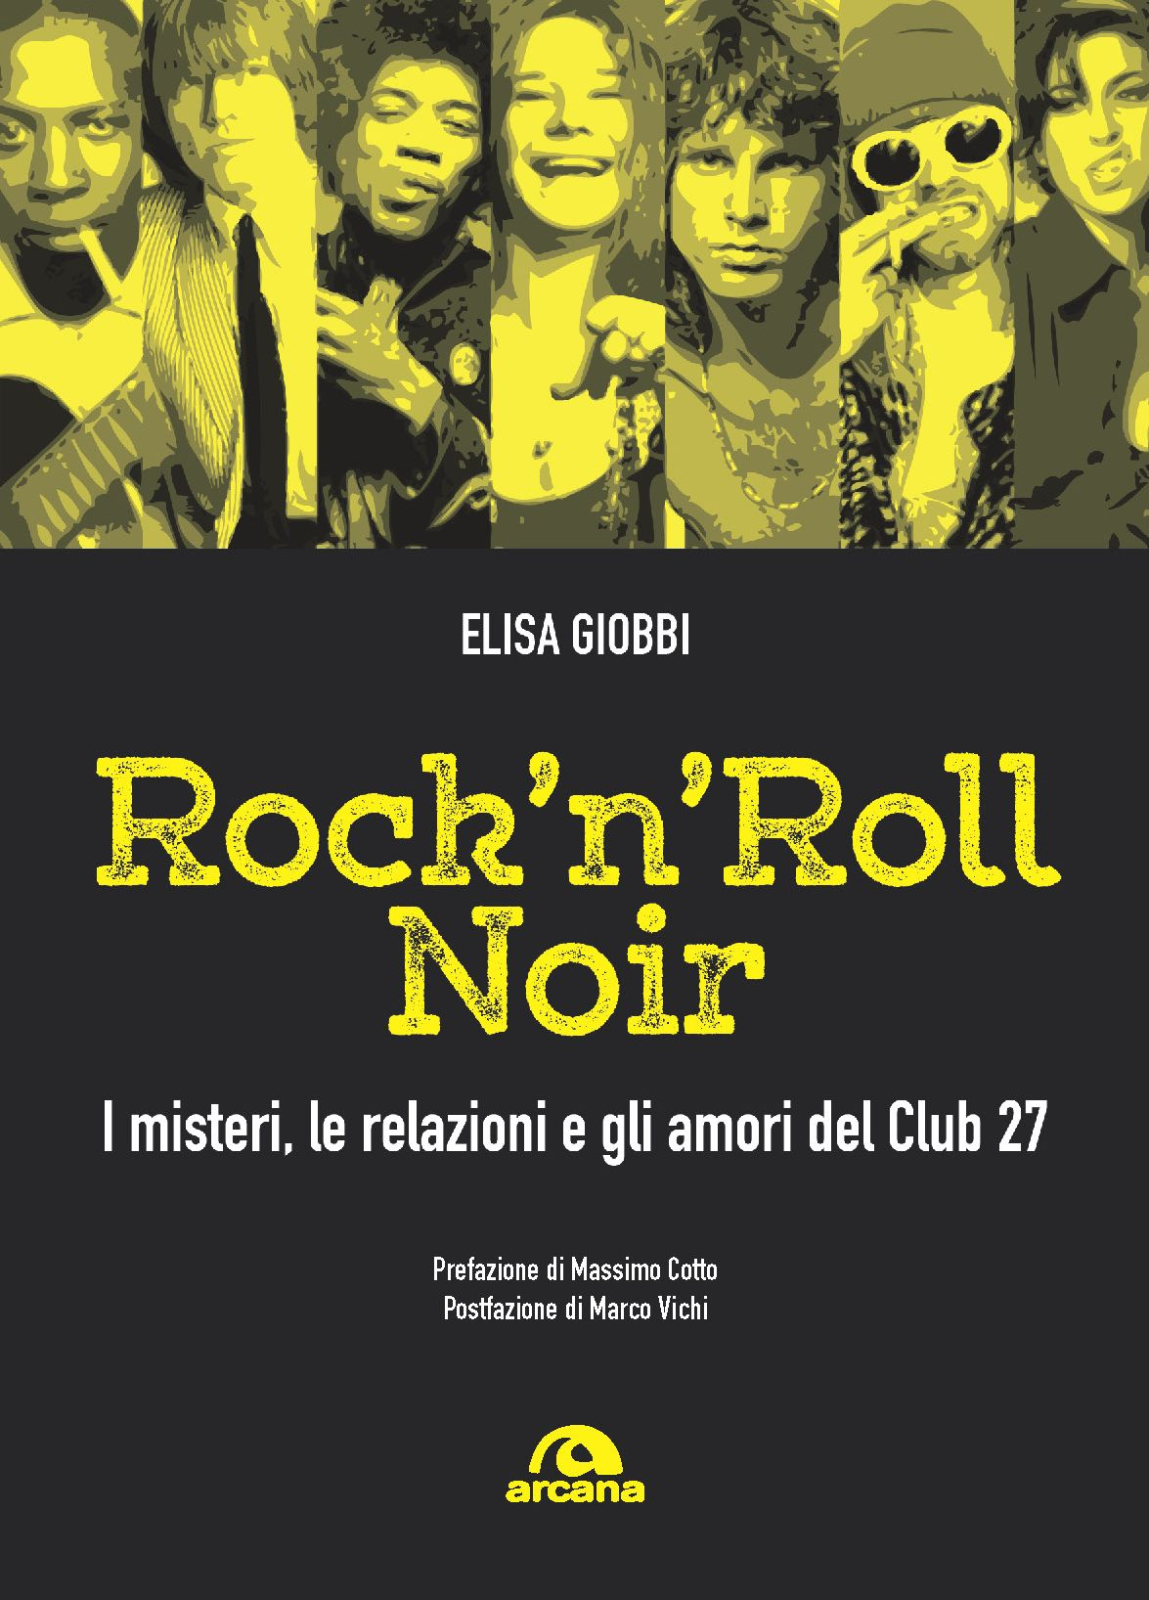 Copertina del libro di Elisa Giobbi ROCK N ROLL NOIR